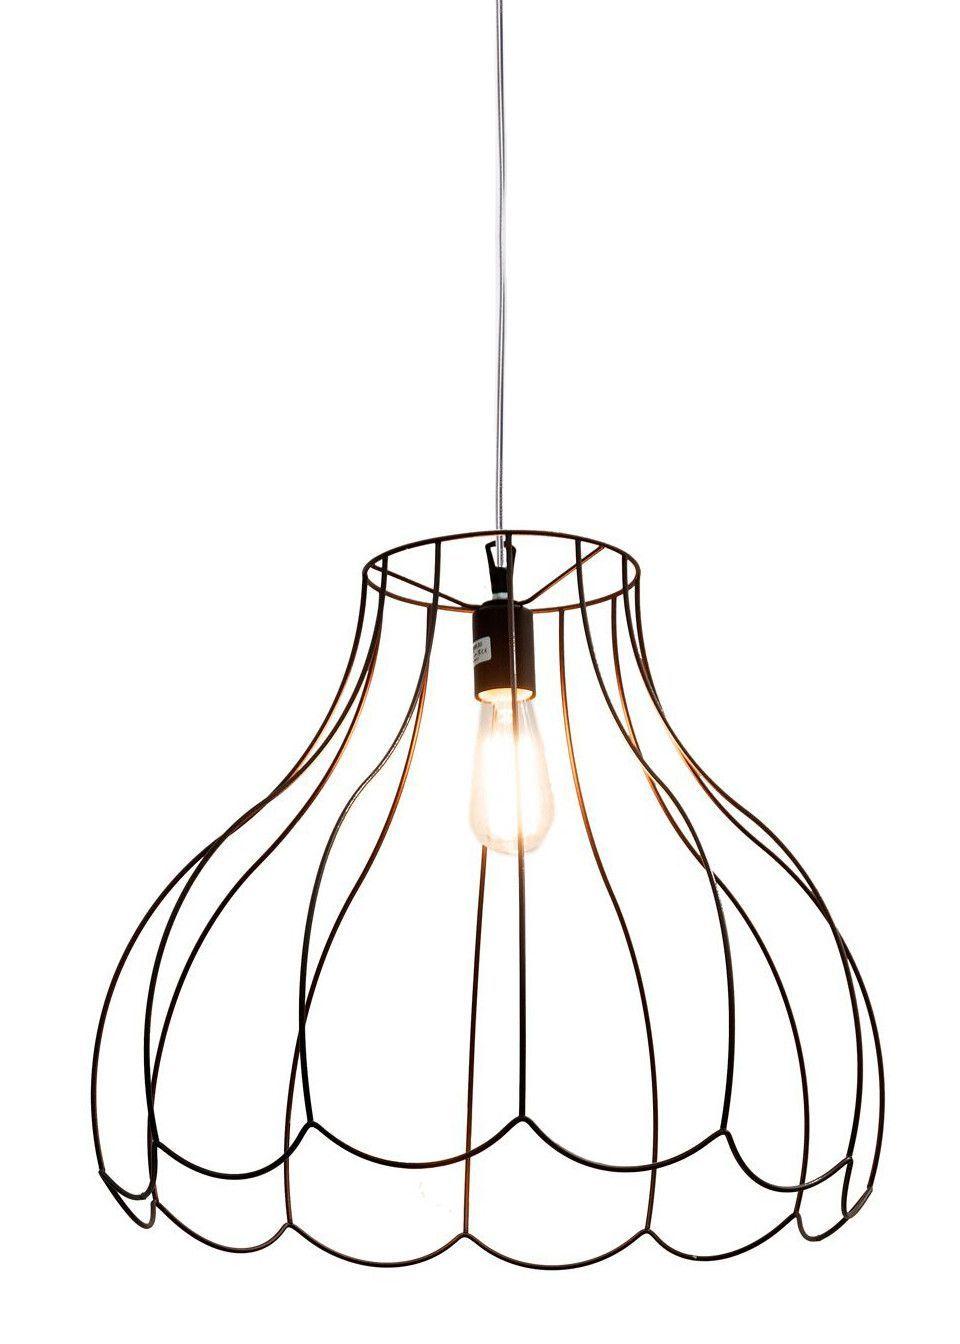 Lucilla dome pendant light pendants and products lucilla dome pendant light arubaitofo Choice Image